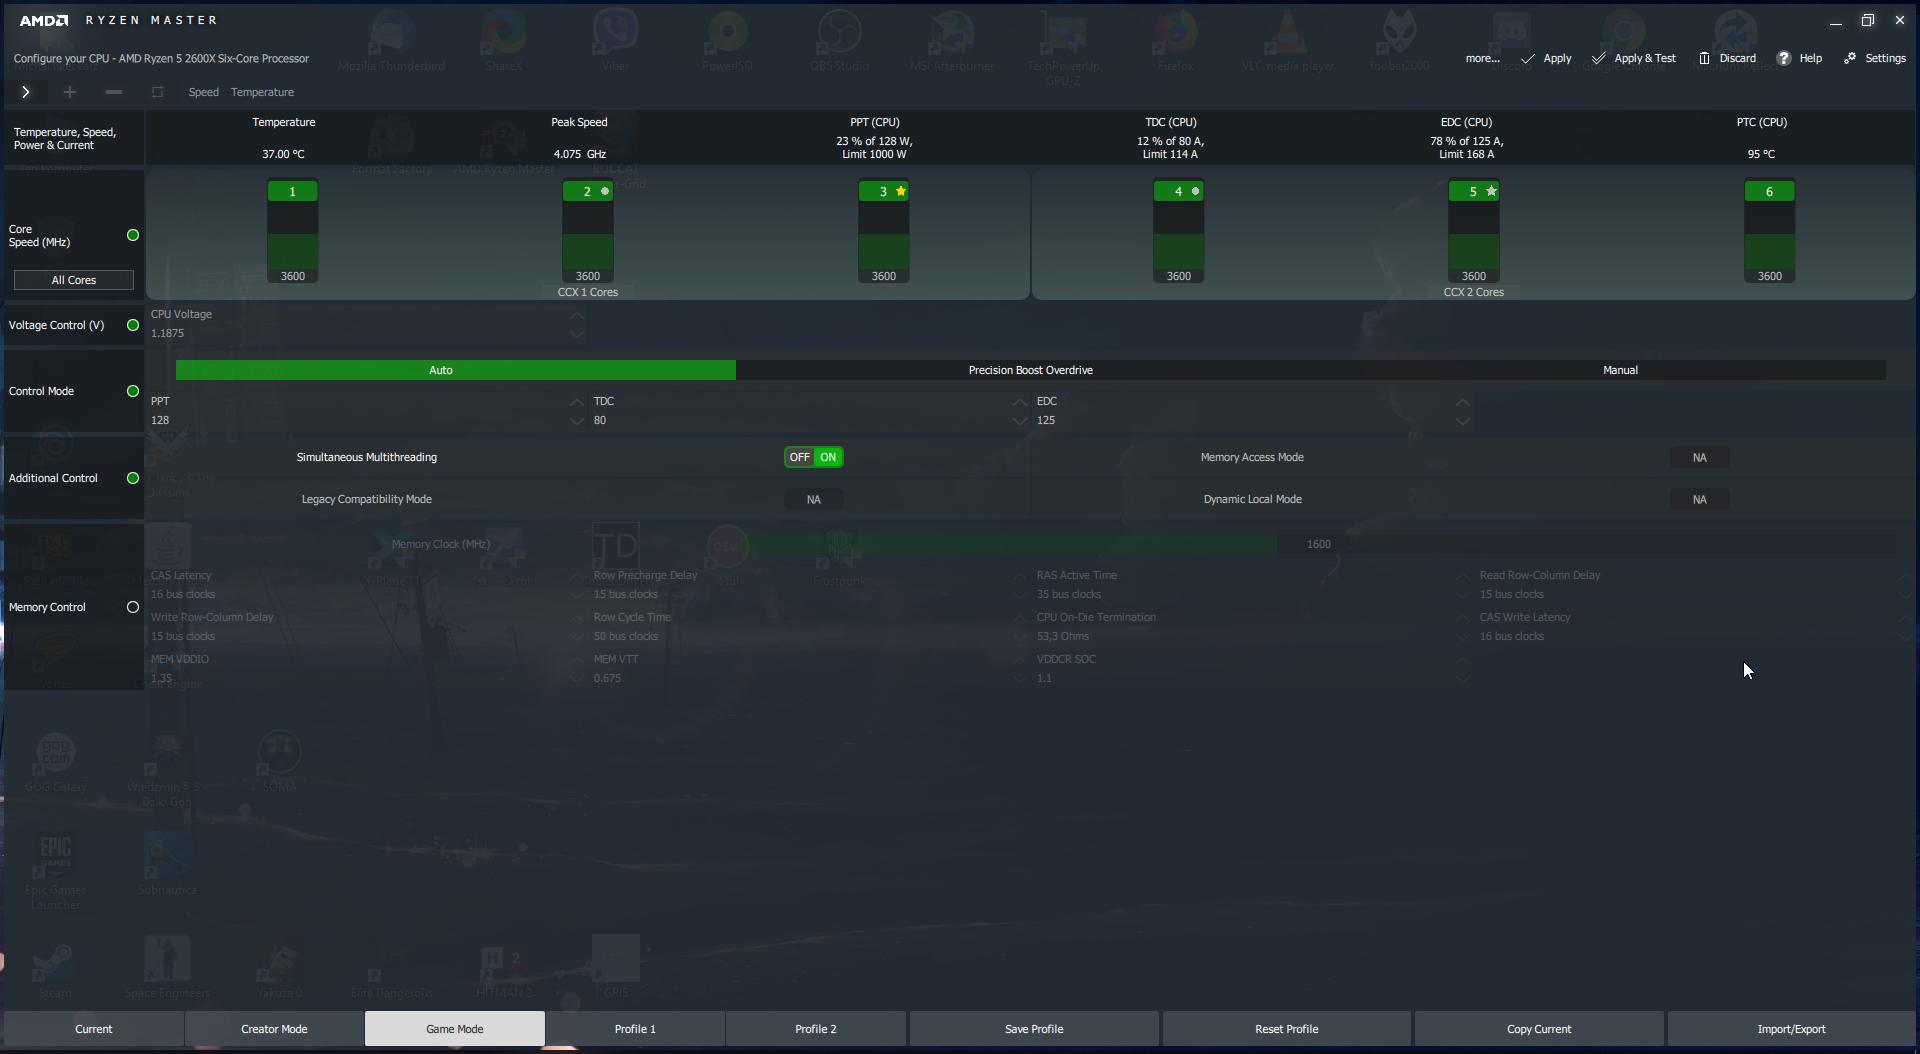 Forum - Technical Support - Random crashes, no error message - Path